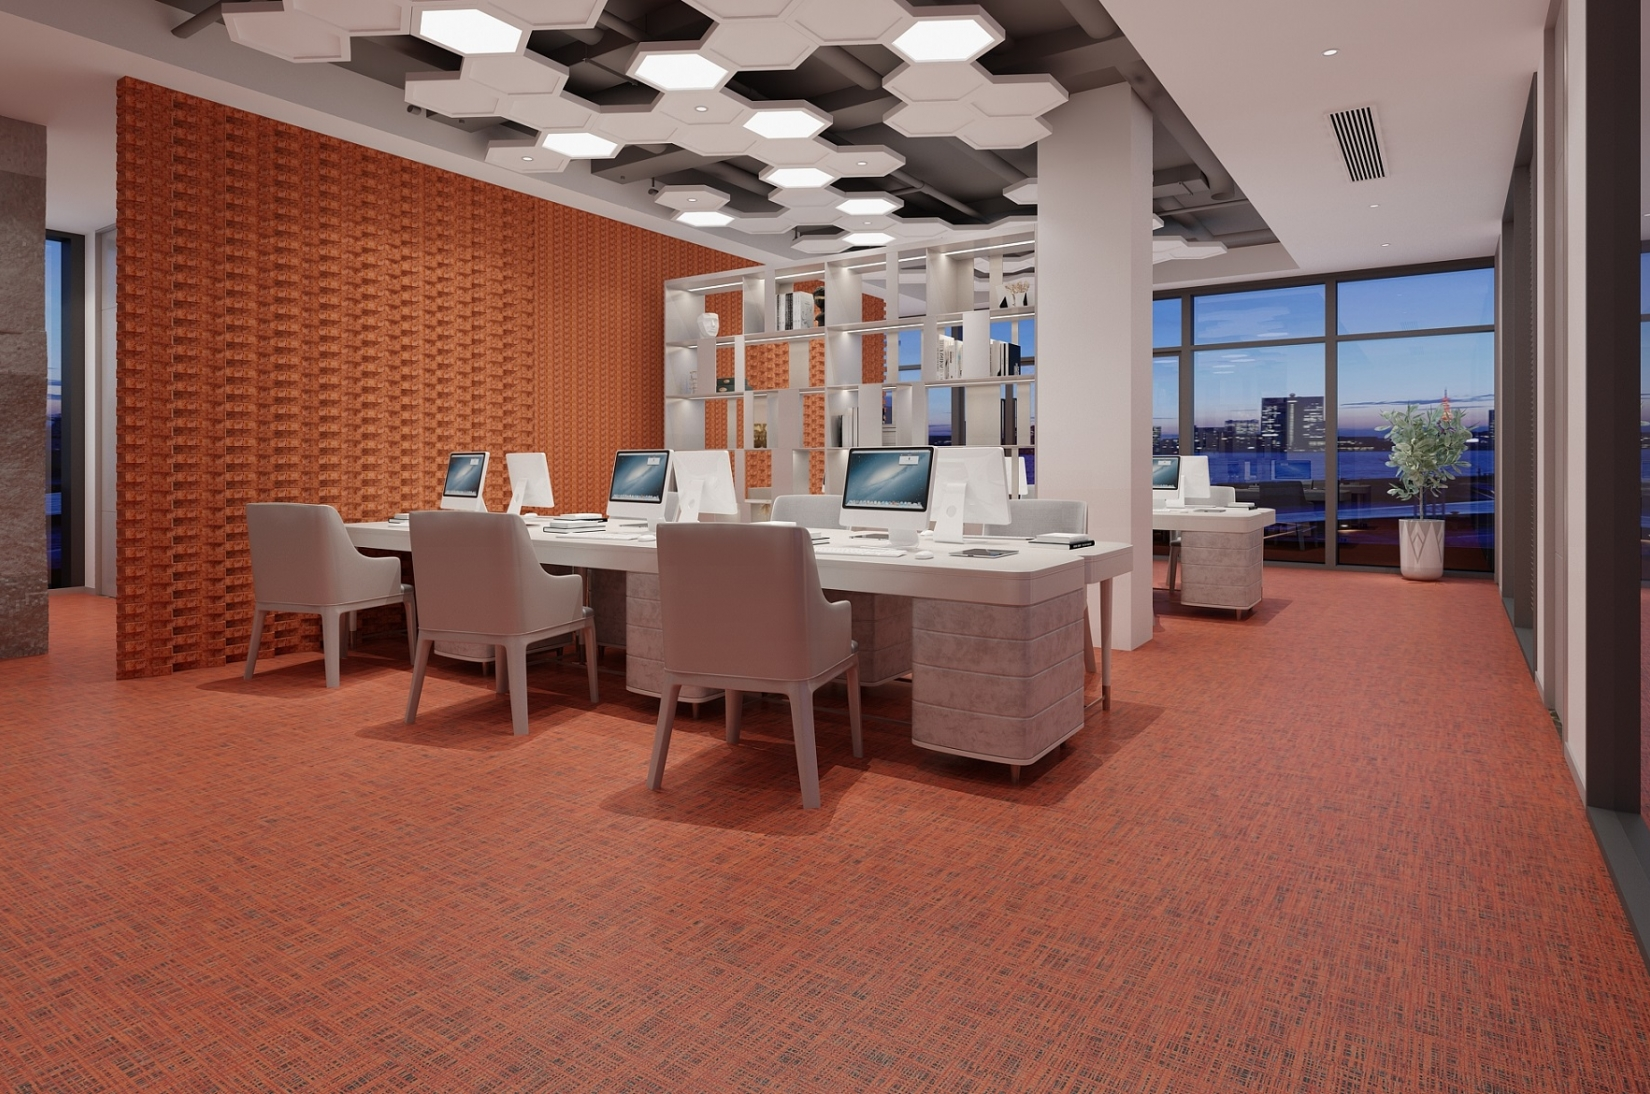 Rubber Flooring - Planks Gym Office